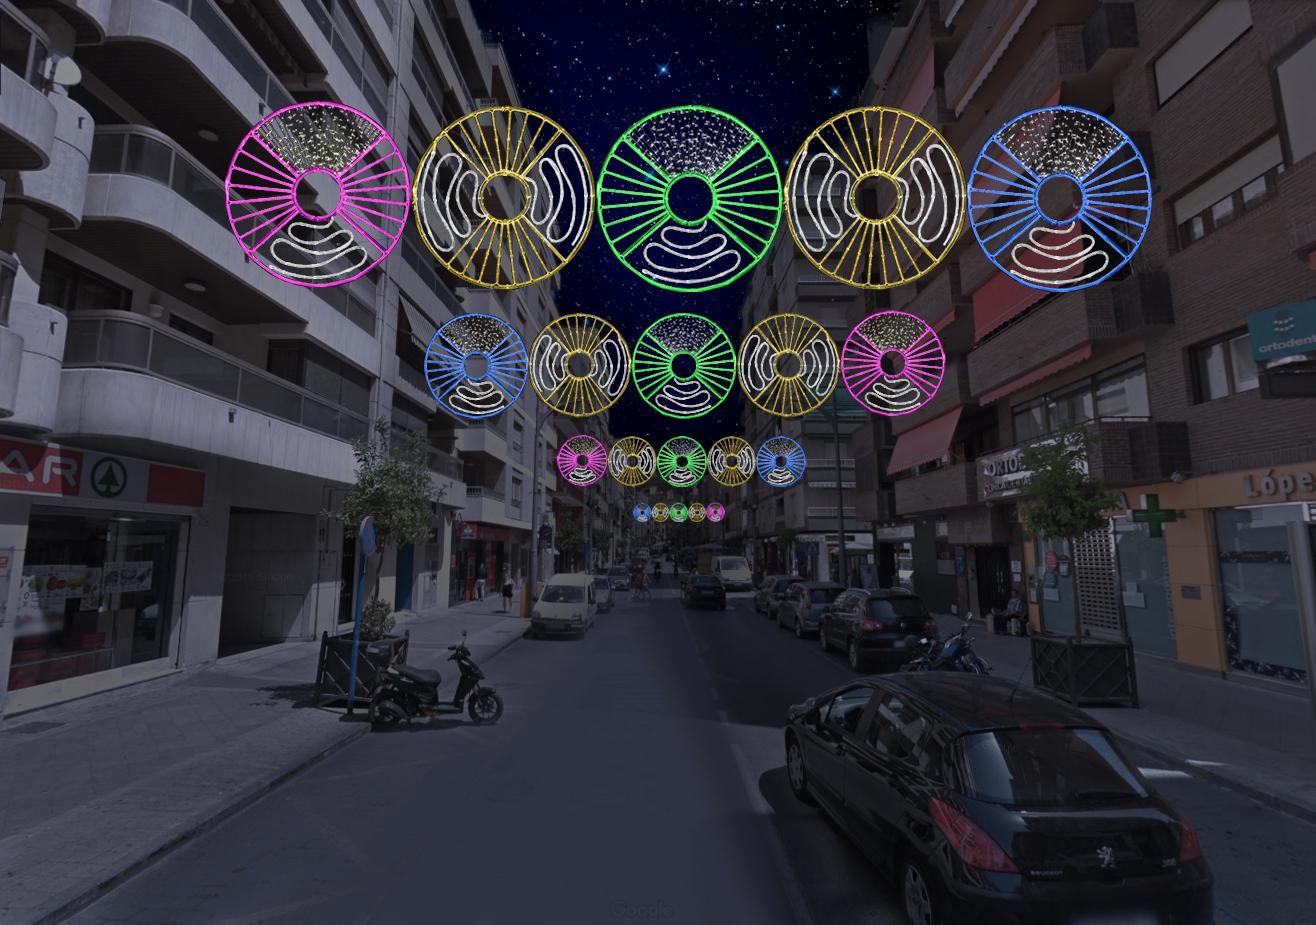 Elecfes Iluminaciones Fiesta 2